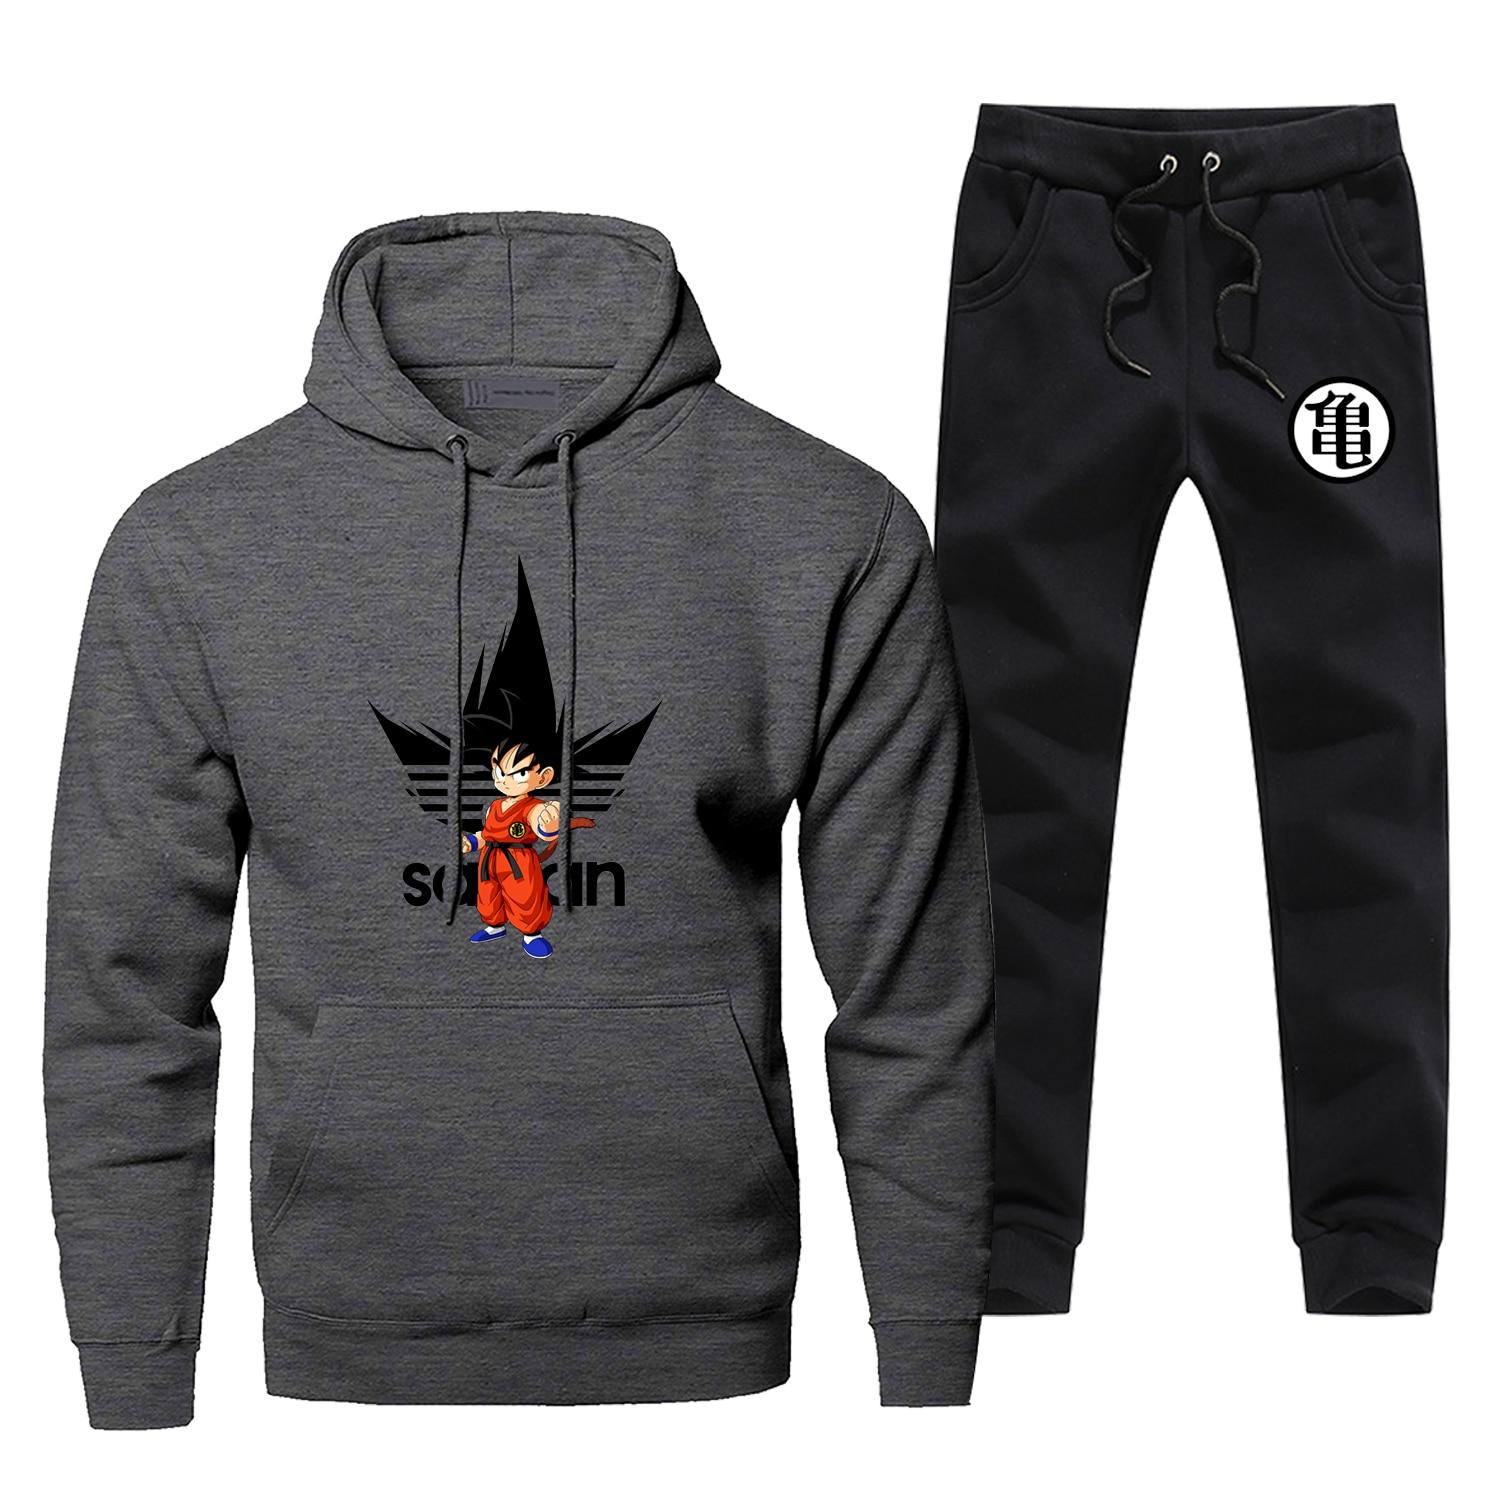 Dragon Ball Z Men's Sets Brand Man Tracksuit Super Saiyan Print Men's Joggingt Harajuku Fleece Pants Hoodies Japan Anime Male Se